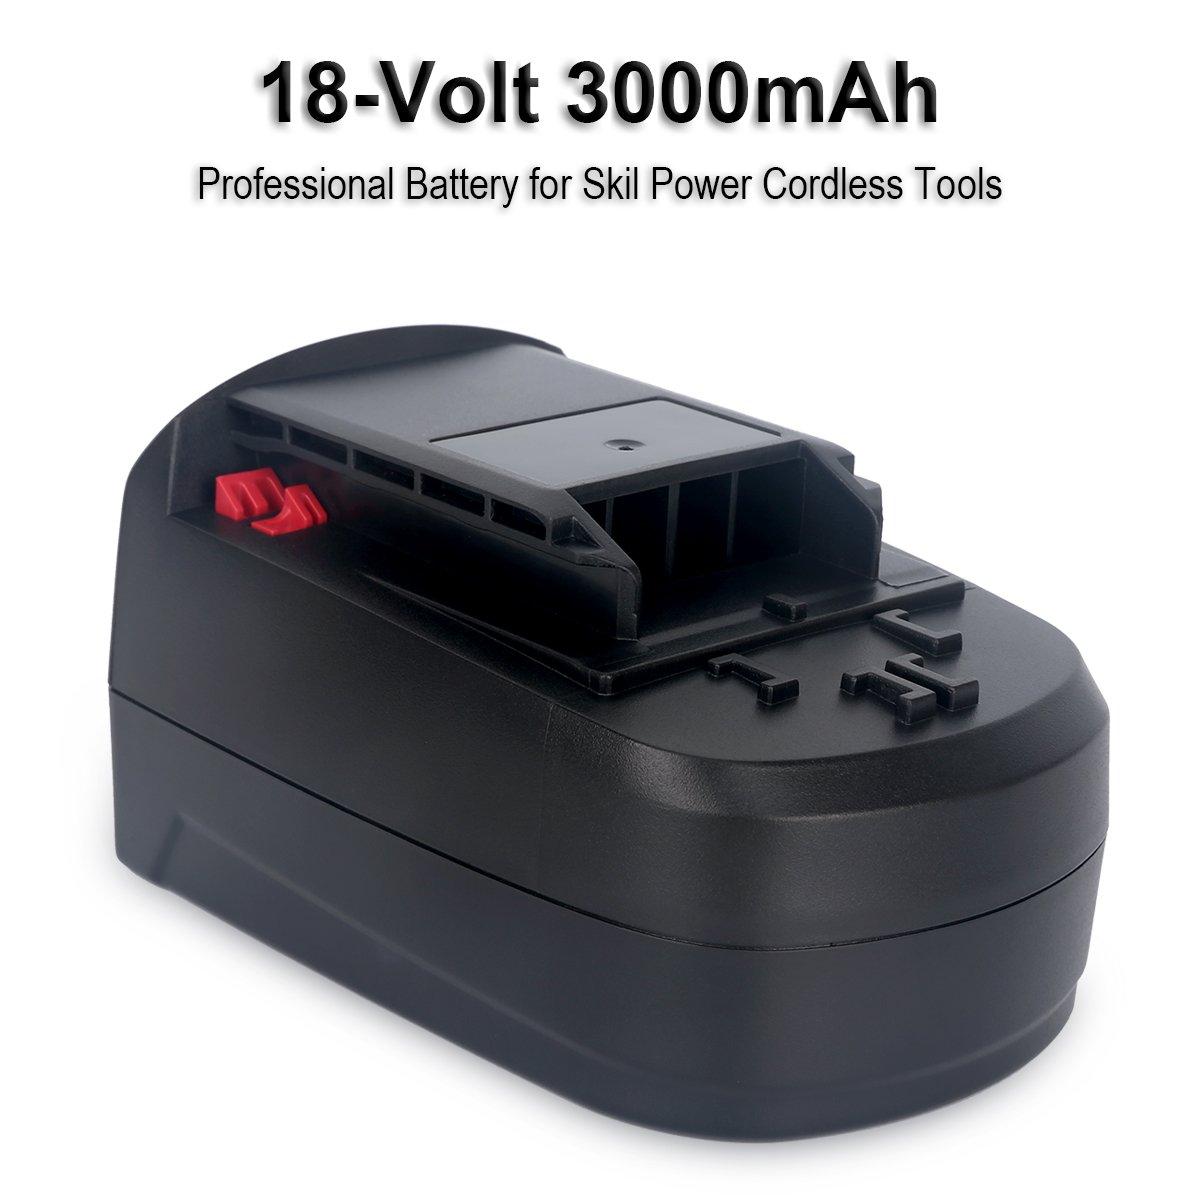 Biswaye 2Pack 18V Battery SB18C SB18A SB18B for Skil 18V Select System Cordless Tools 2810 2888 2895 2897 2898 4570 5850 5995 7305 9350, 3000mAh Ni-Cd by Biswaye (Image #2)